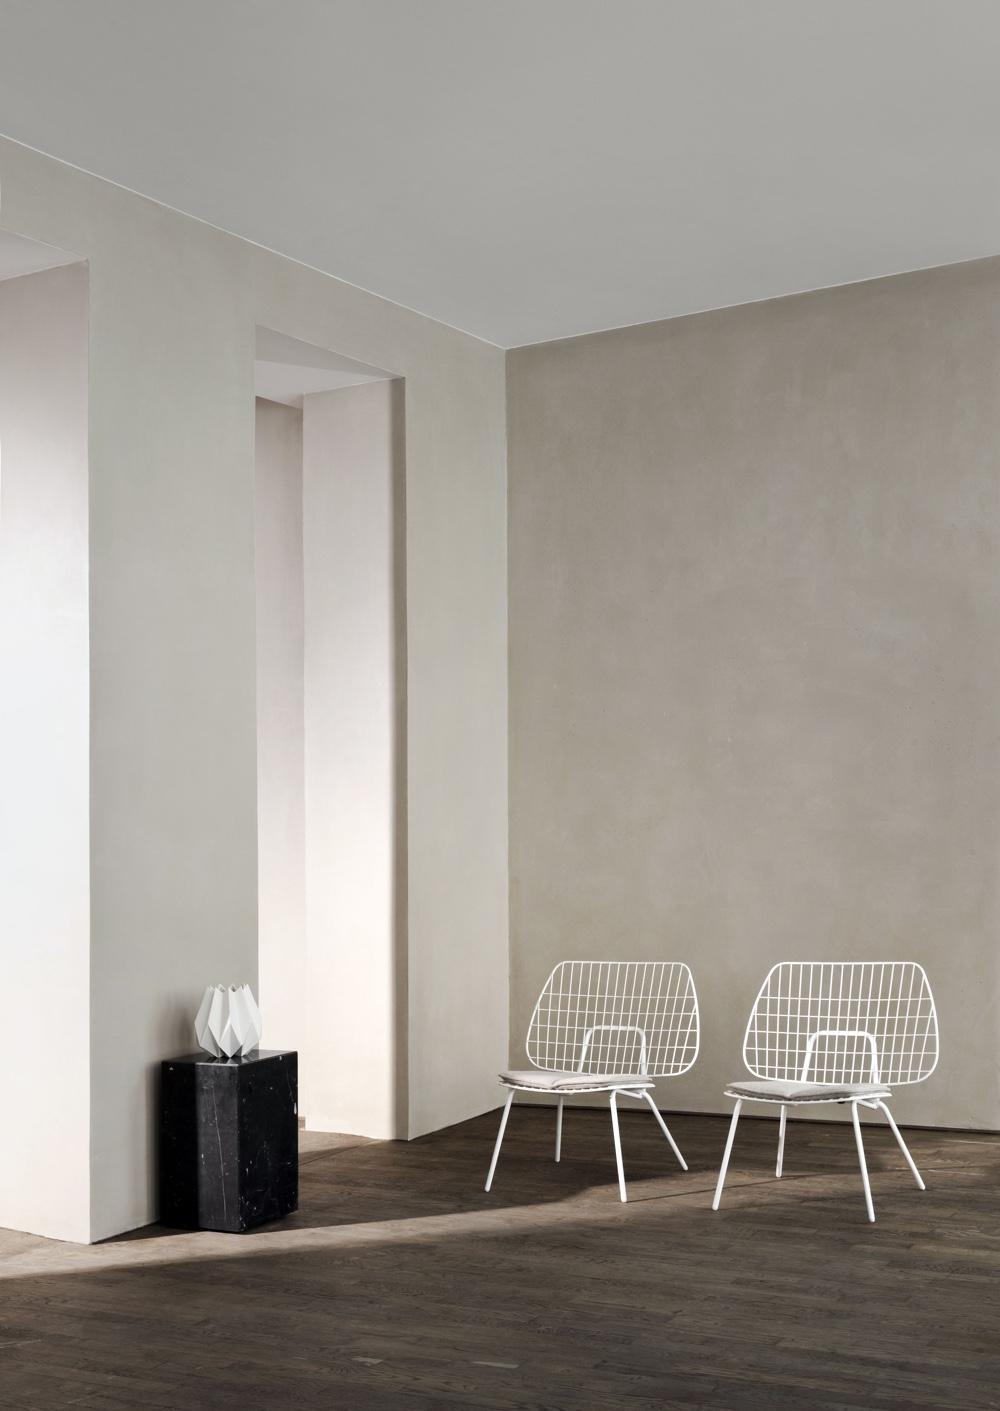 Принципы модернизма - белые стулья